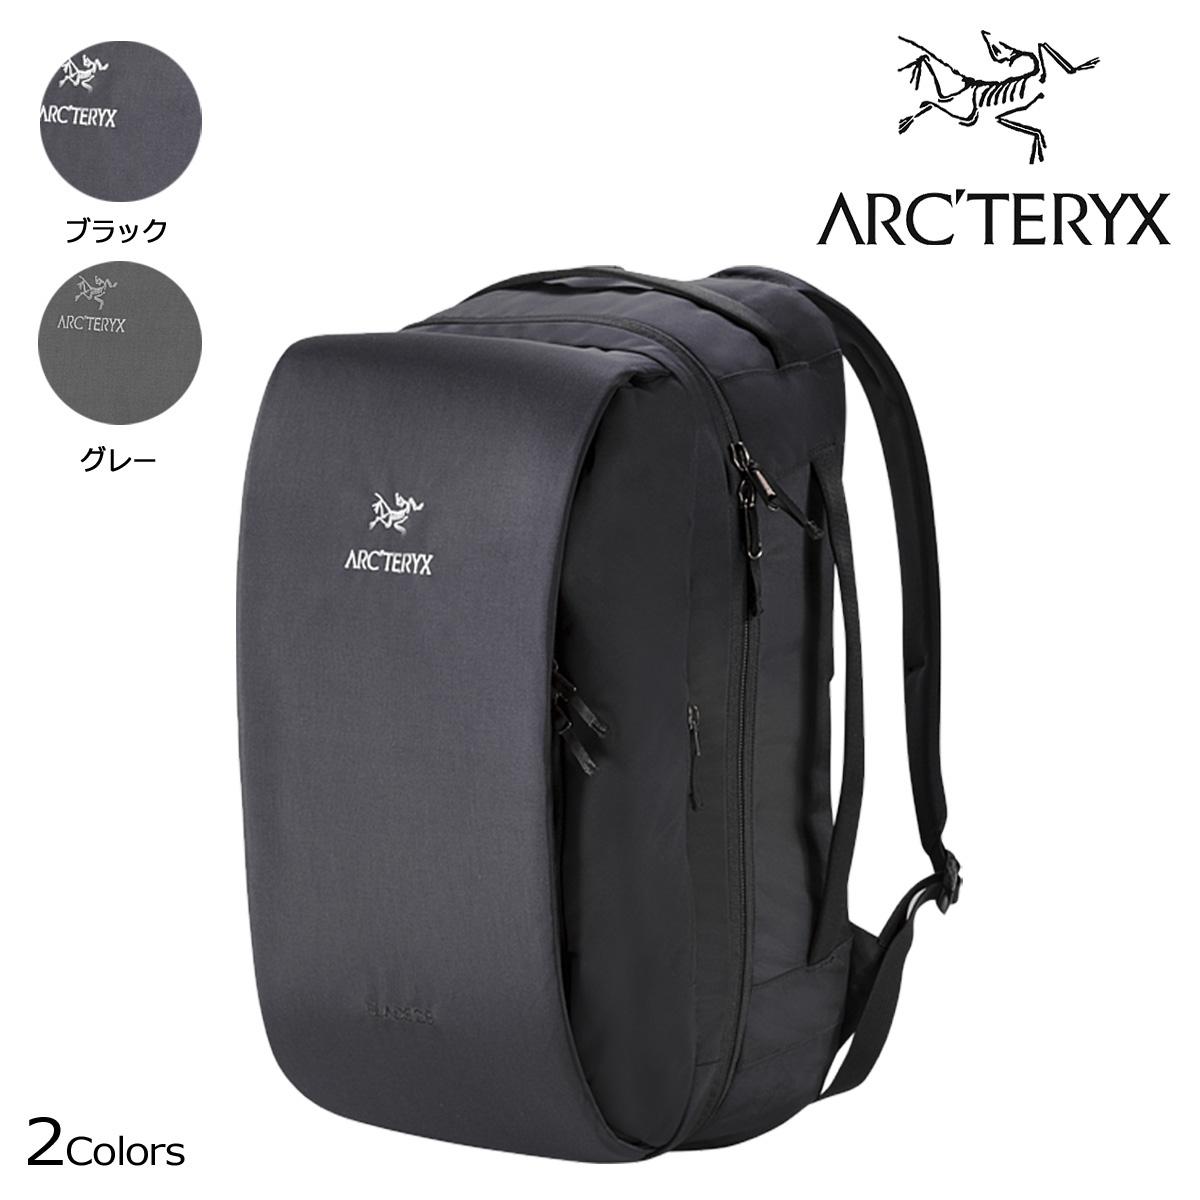 ARC'TERYX アークテリクス リュック バックパック ブレード28 28L 16178 BLADE BACKPACK メンズ ブラック グレー [2/12 追加入荷]